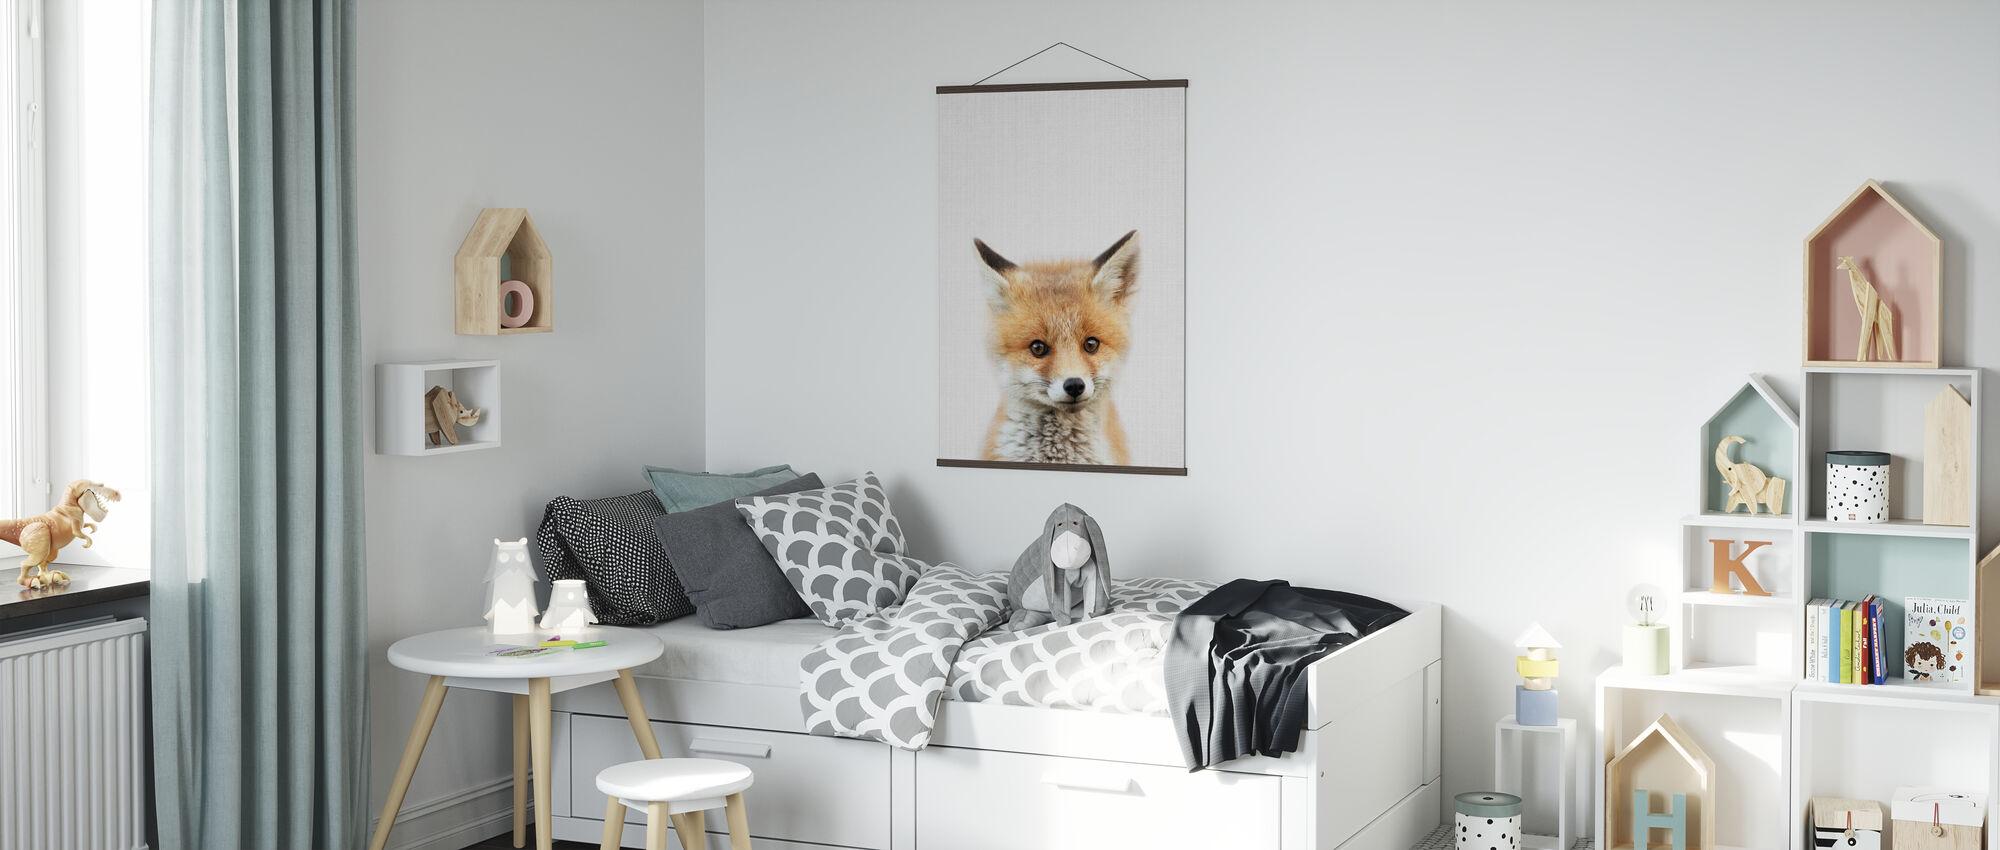 Baby Fox - Plakat - Barnerom